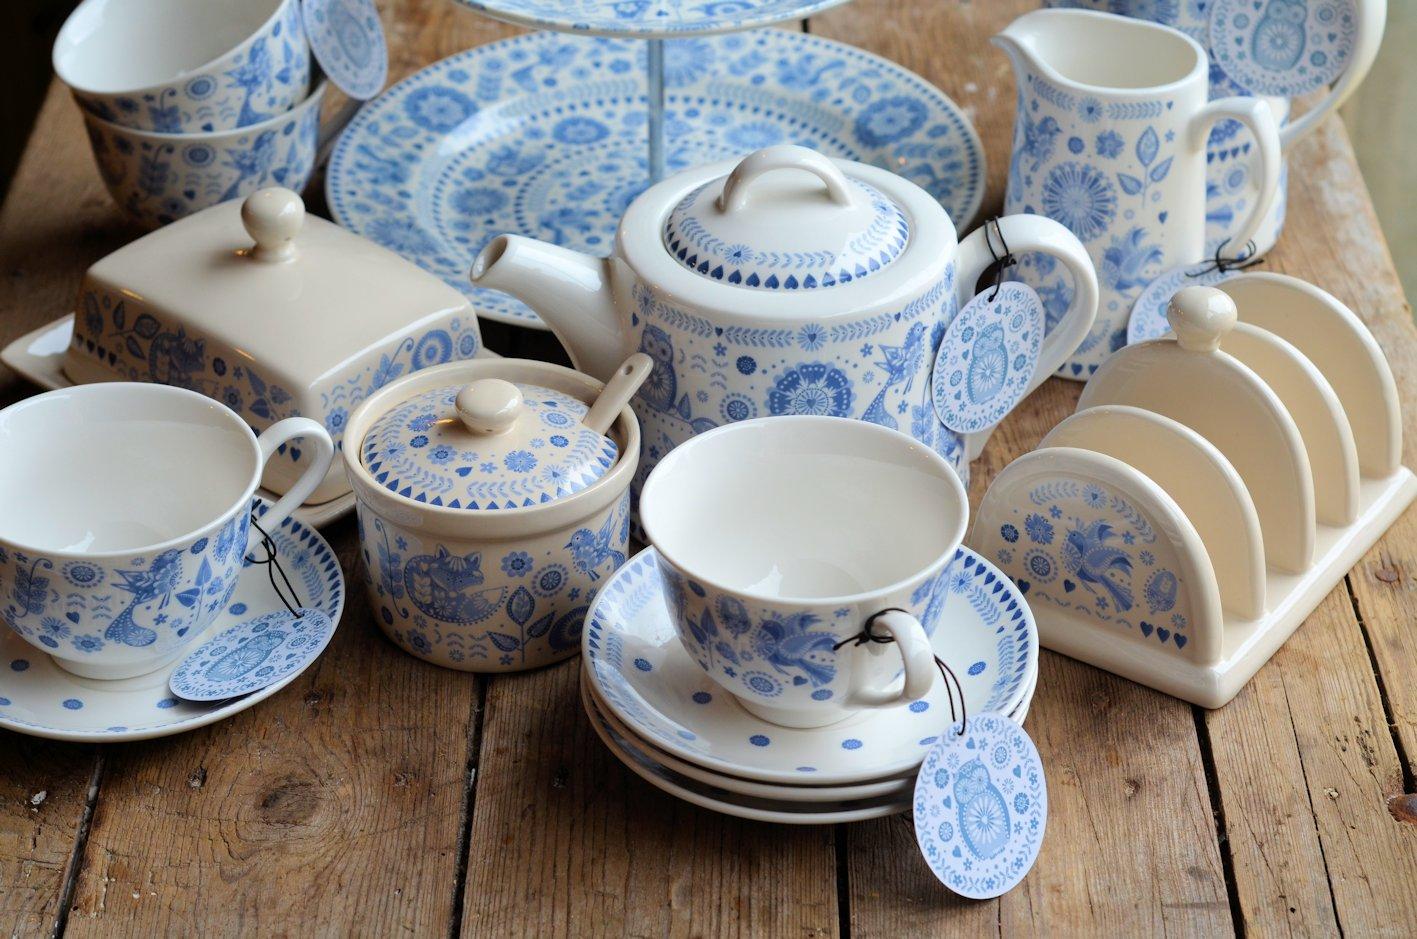 Churchill China - Penzance & Mothering Sunday and Blue \u0026 White China: Little Victoria Lemon ...